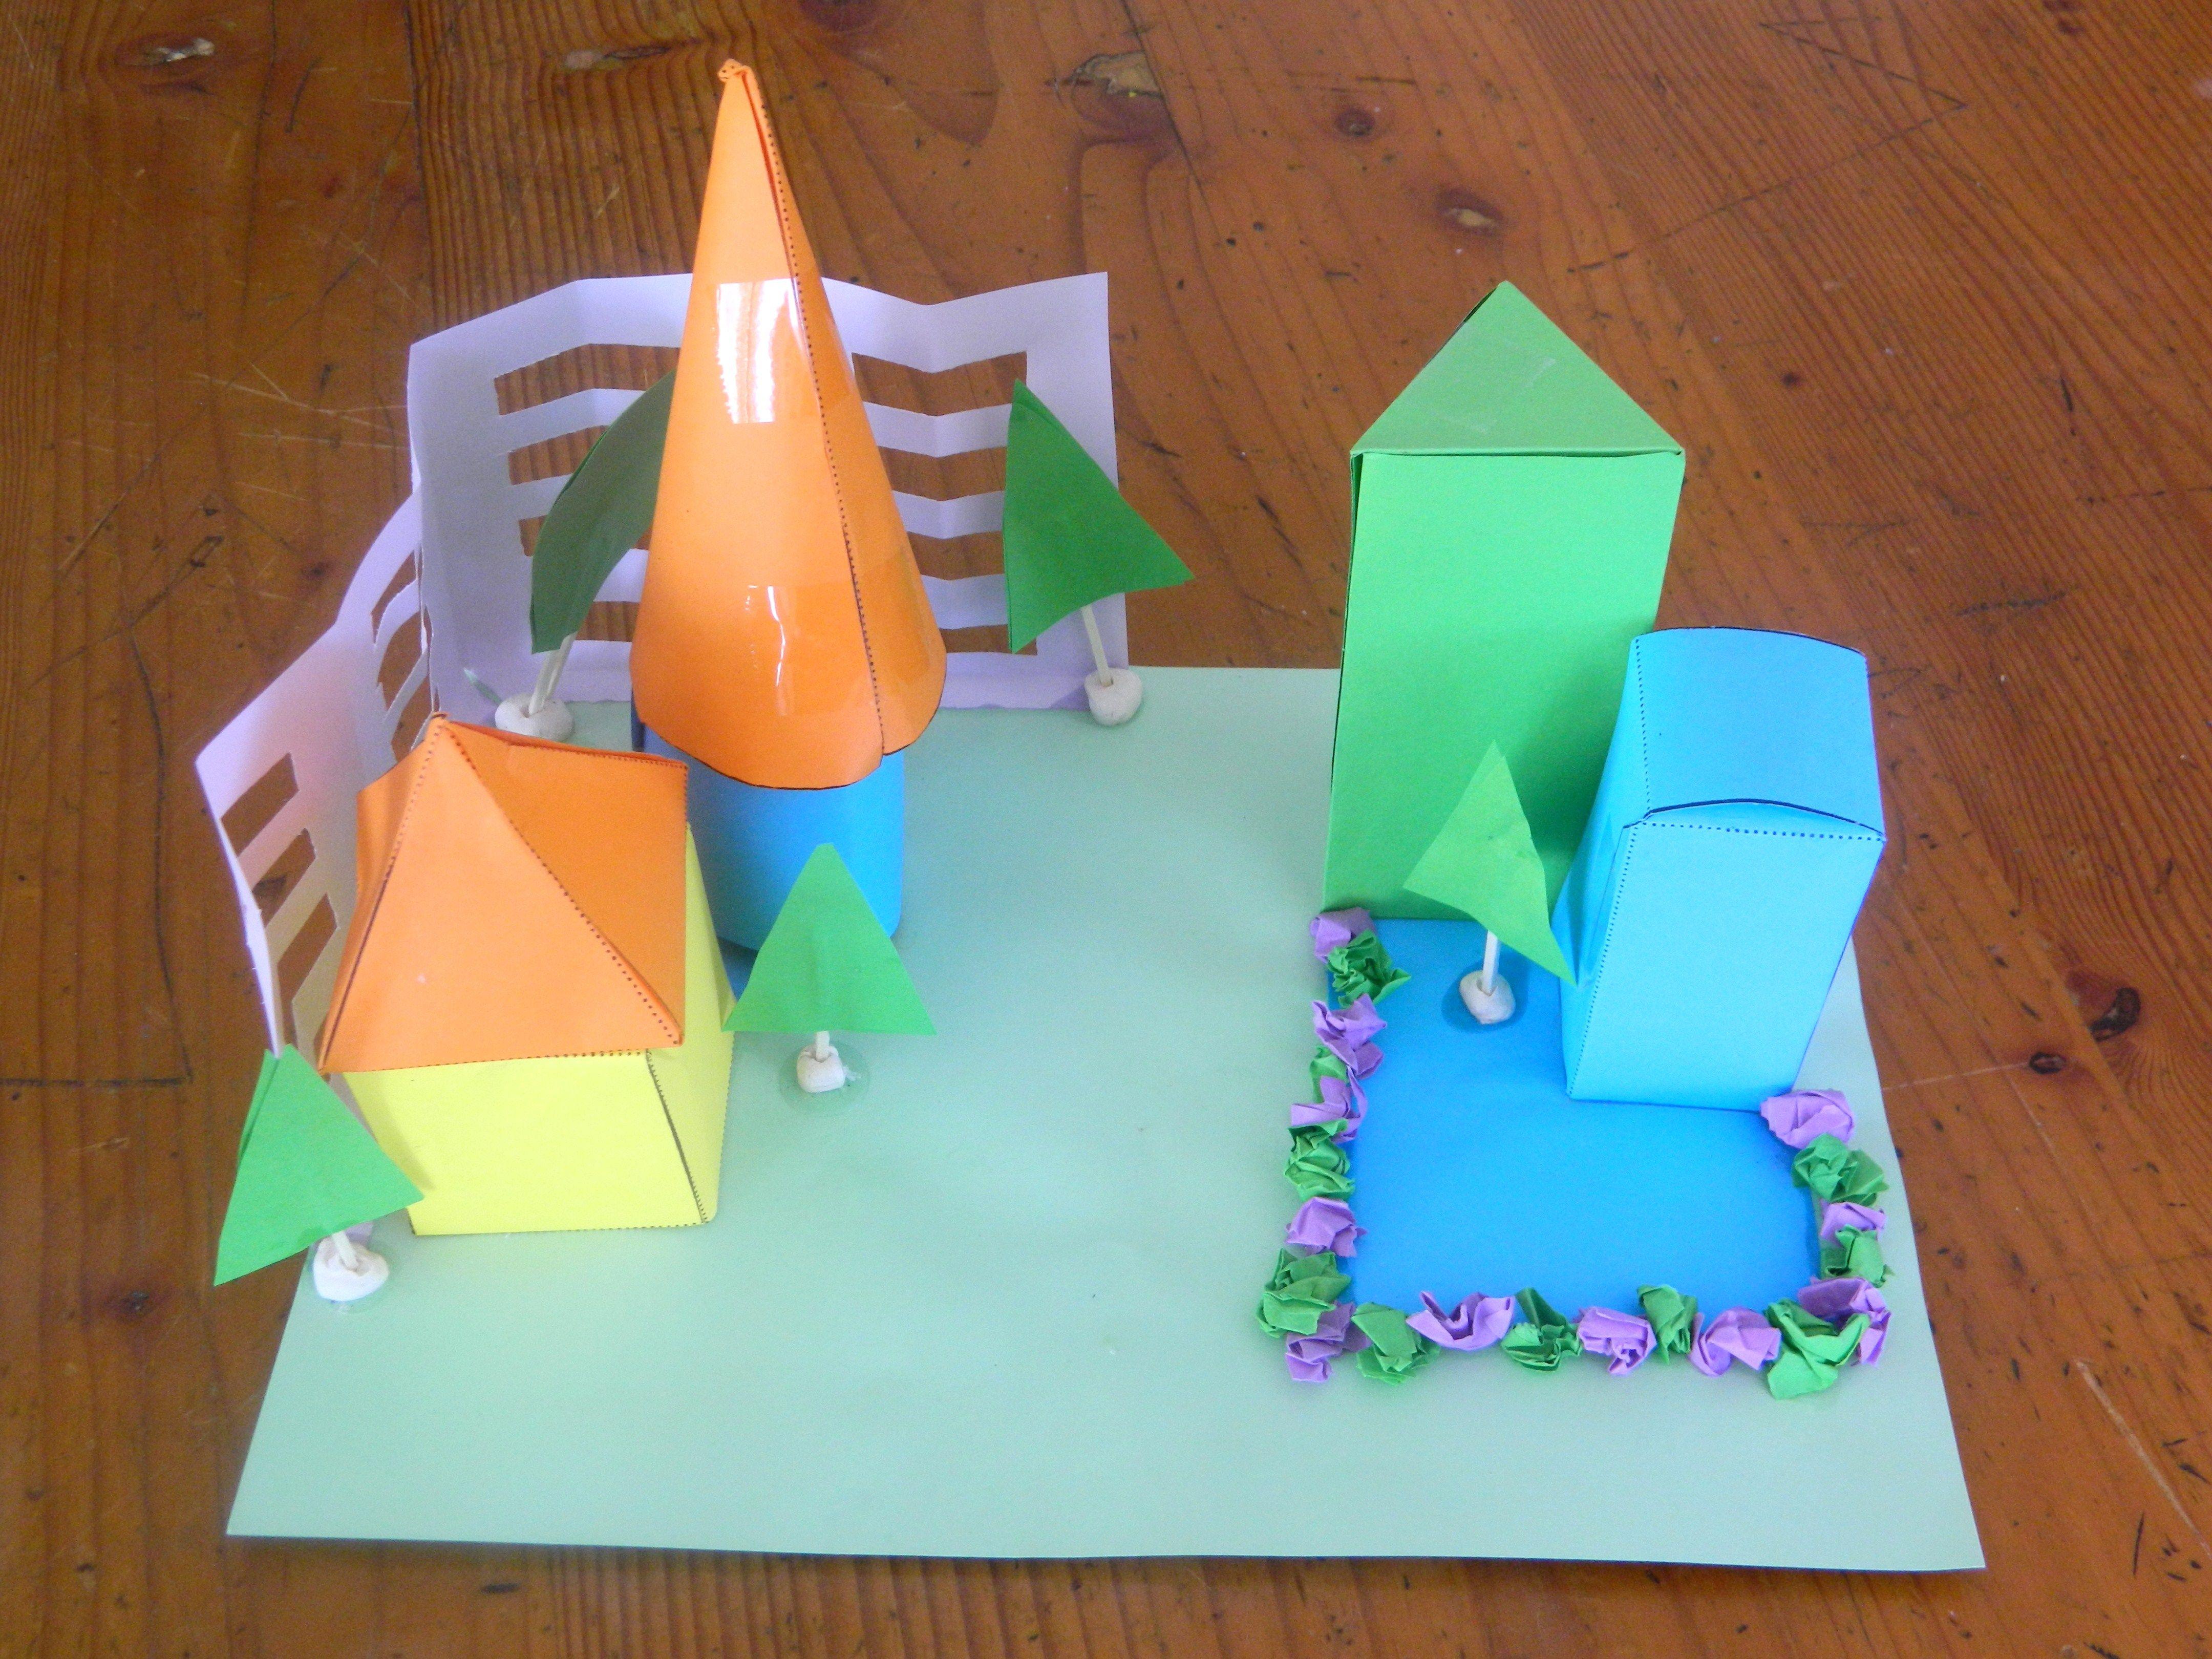 Use 3d Shape Nets To Create A Cardboard Construction Each